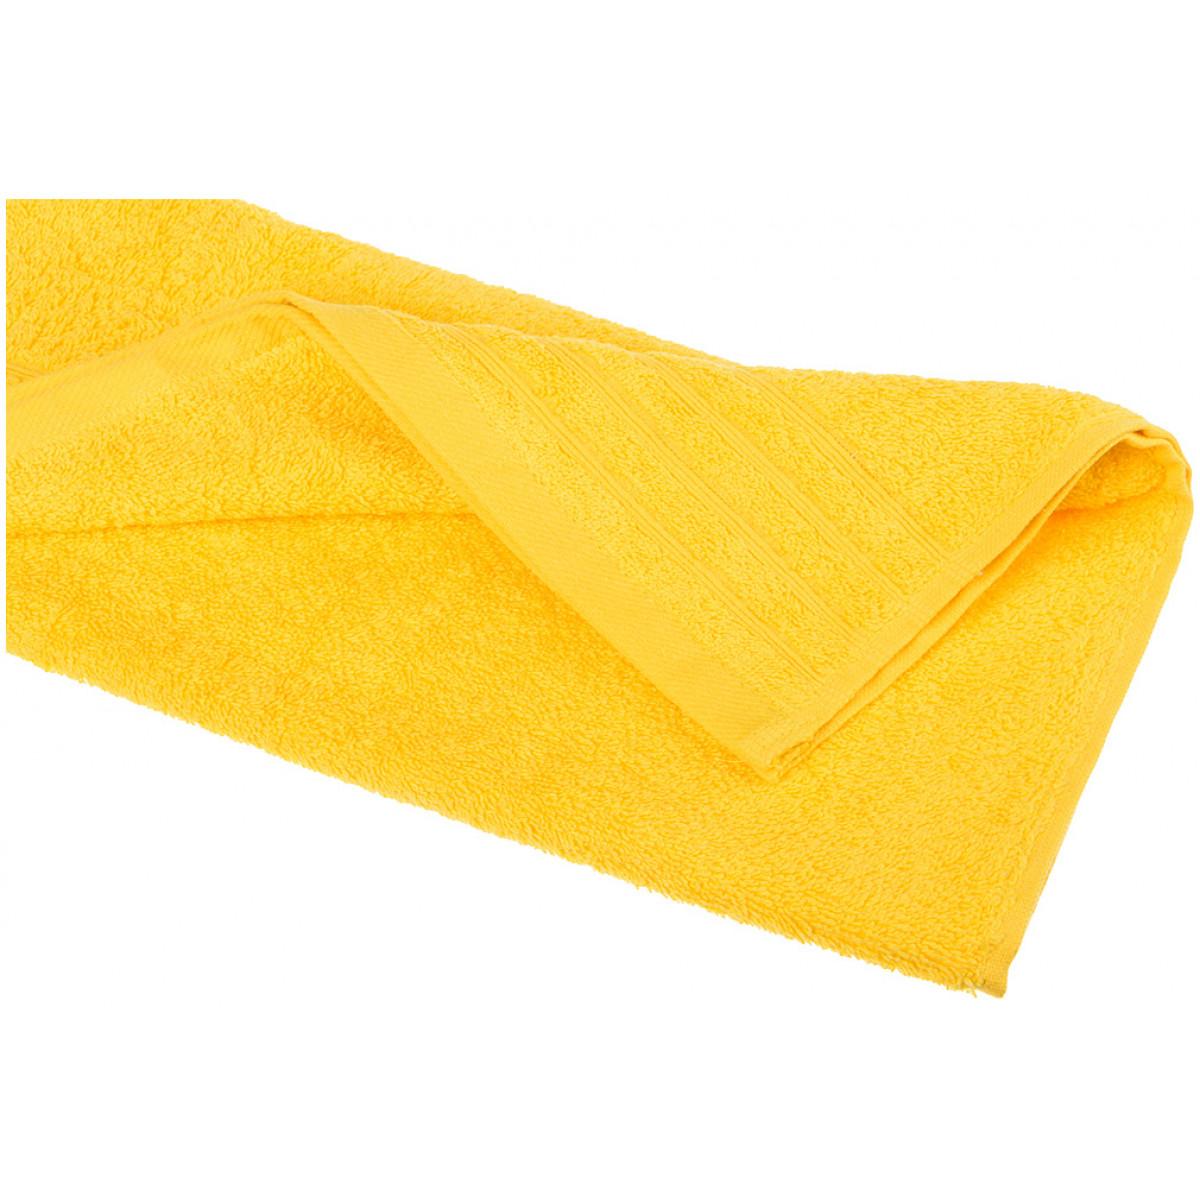 Полотенца Santalino Полотенце Mira  (40х70 см) полотенца santalino полотенце shulamite 40х70 см